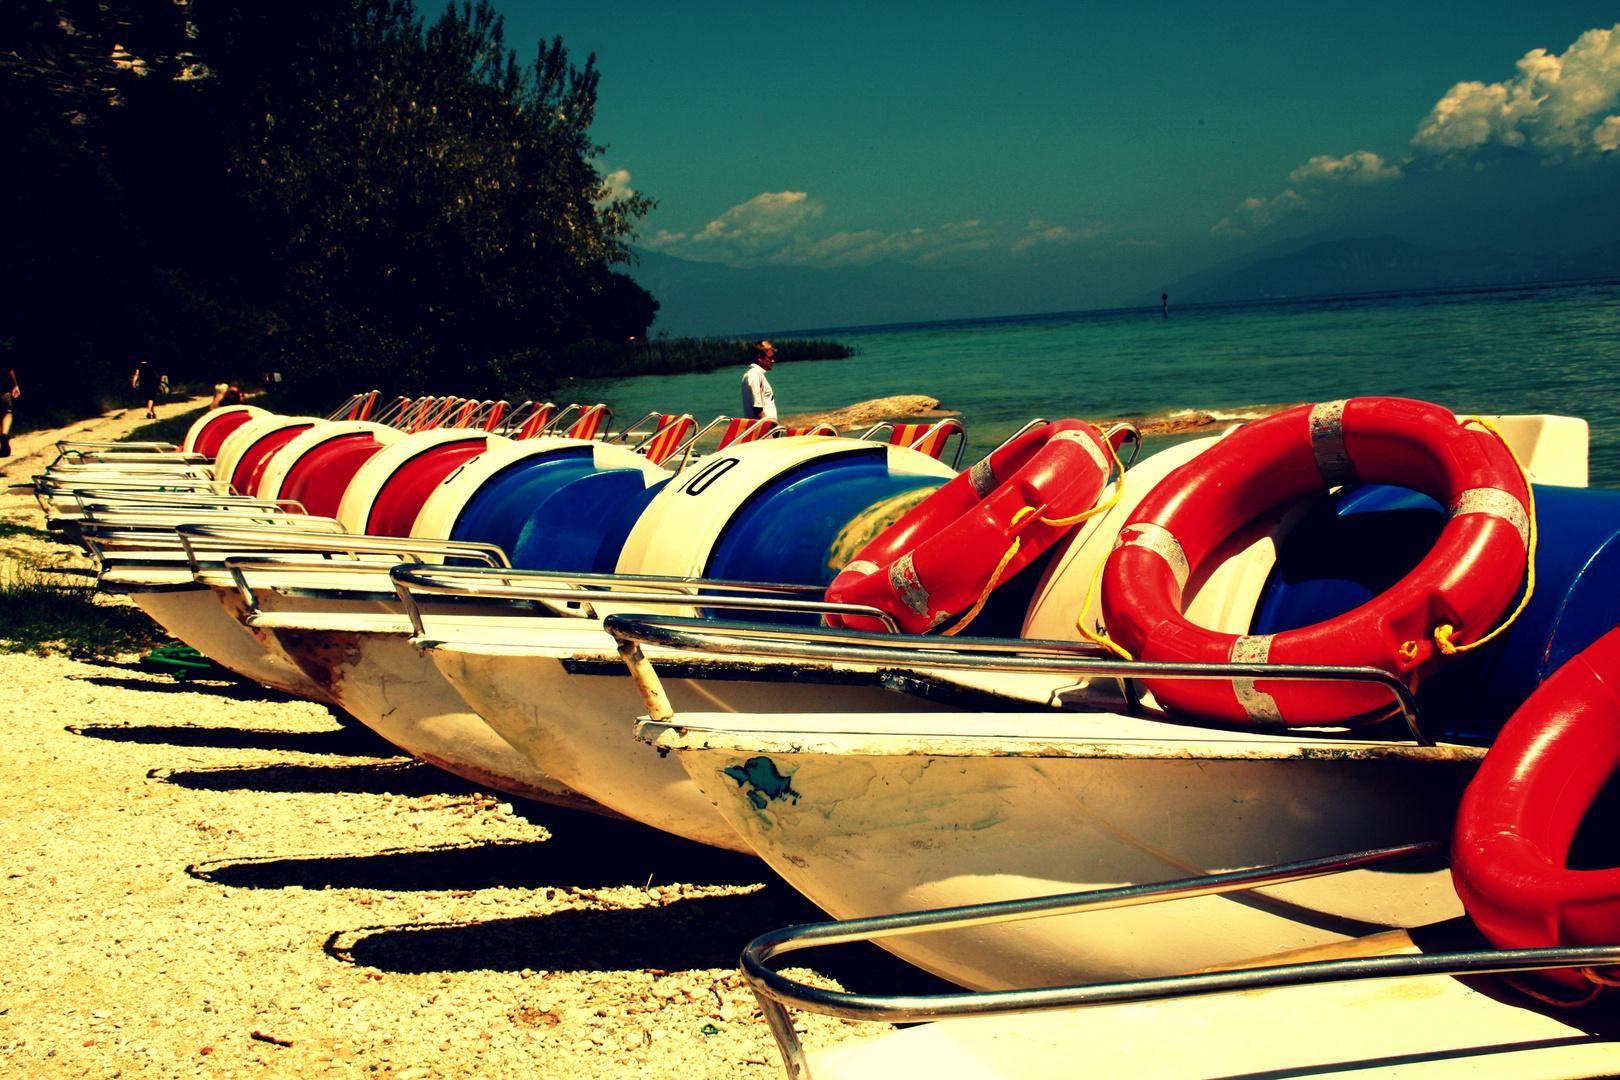 Italy Holliday at Lago di garda